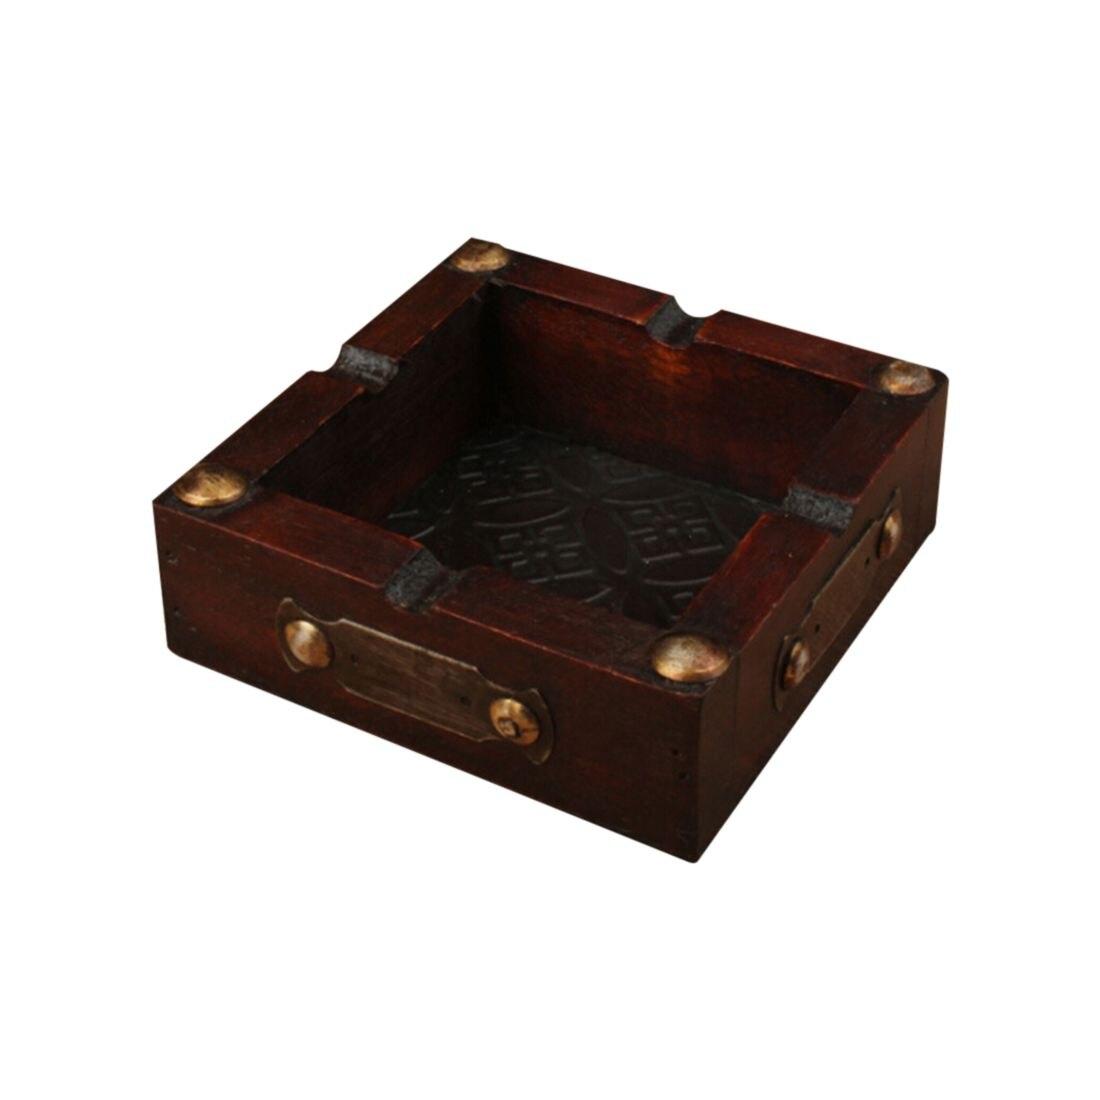 Practical Boutique Vintage Wood Ashtray Cigarette Cigar Handmade Tobacco Wooden Case Cigarette Rests For Smoking Convenience B